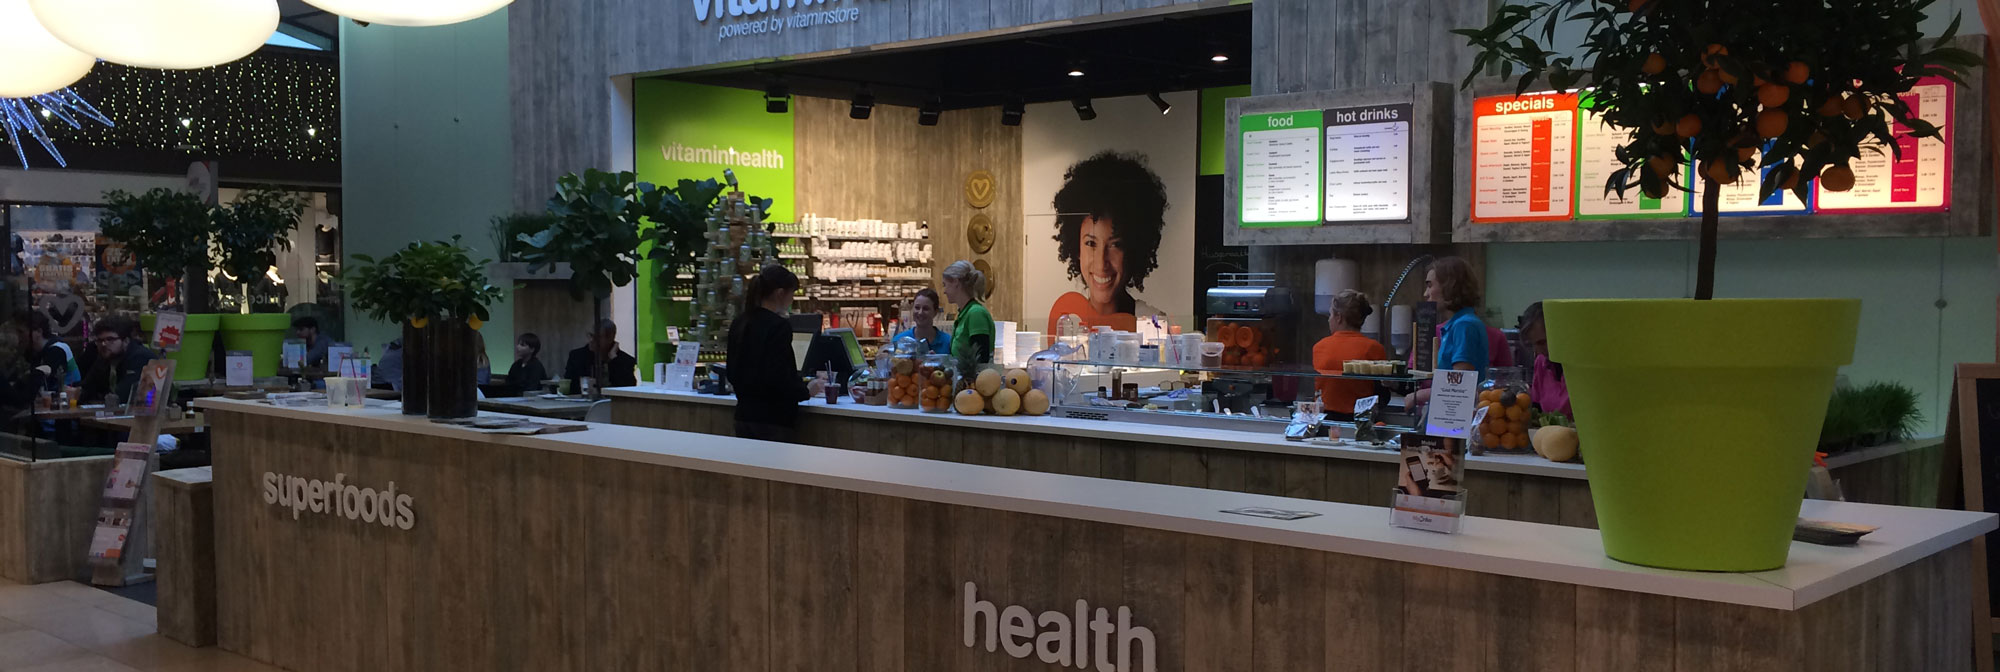 Vitamin-Boost_Stadshart-Amstelveen2